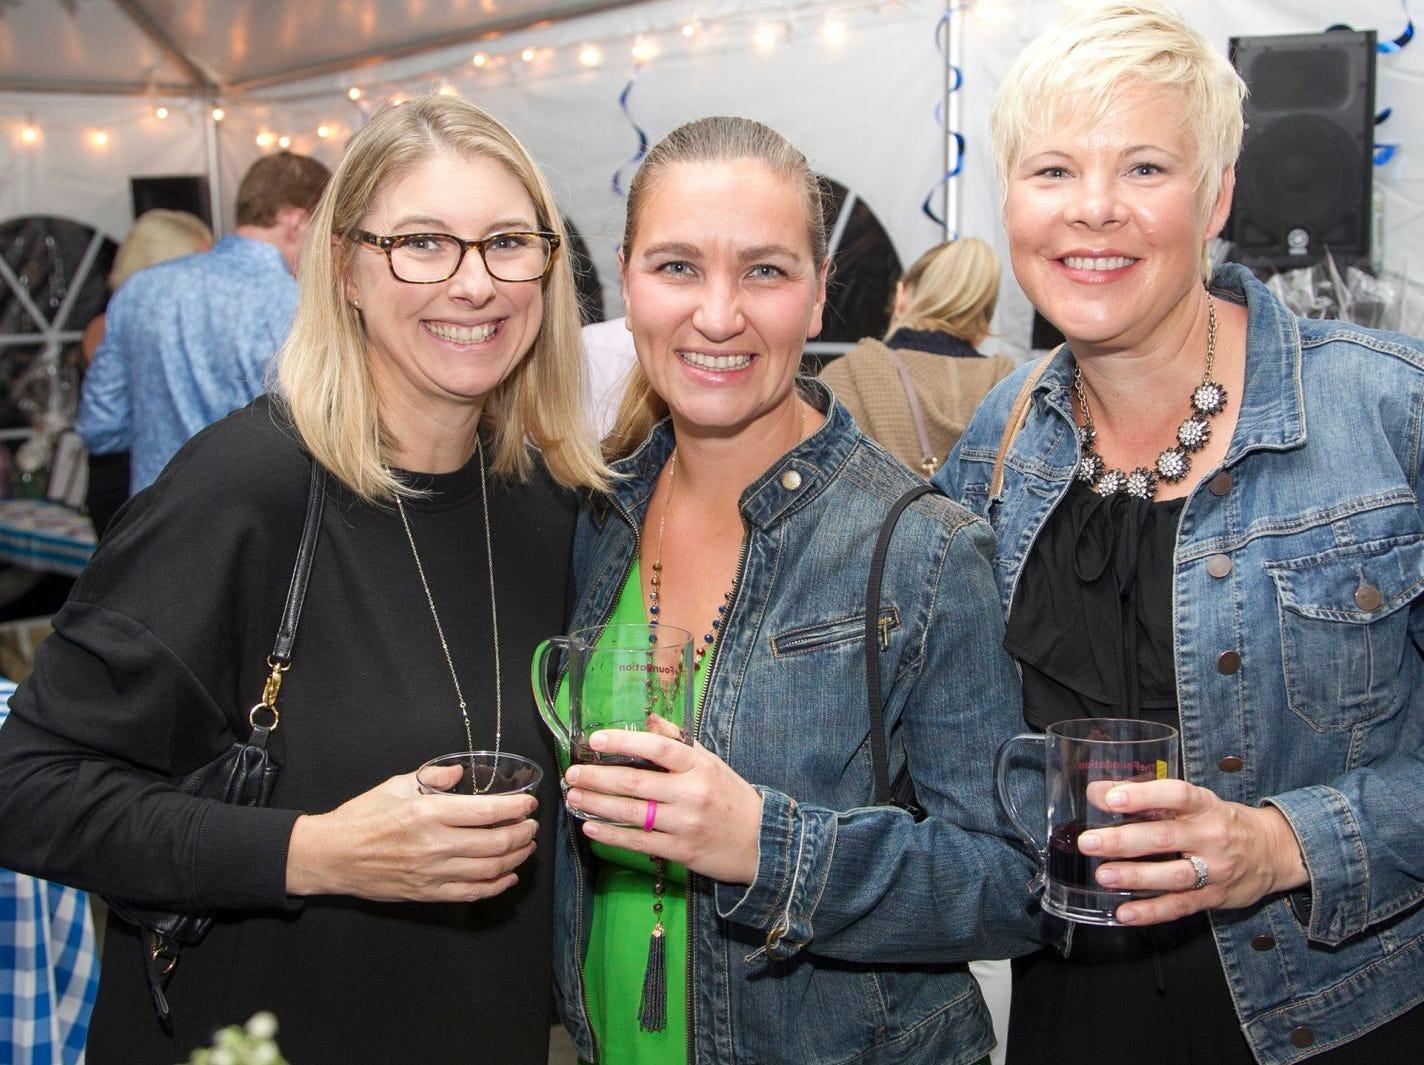 Amy Gill, Kristen Daffron, Lynn Macki. Ridgewood Education Foundation's 2018 Oktoberfest at the Hermitage. 09/29/2018